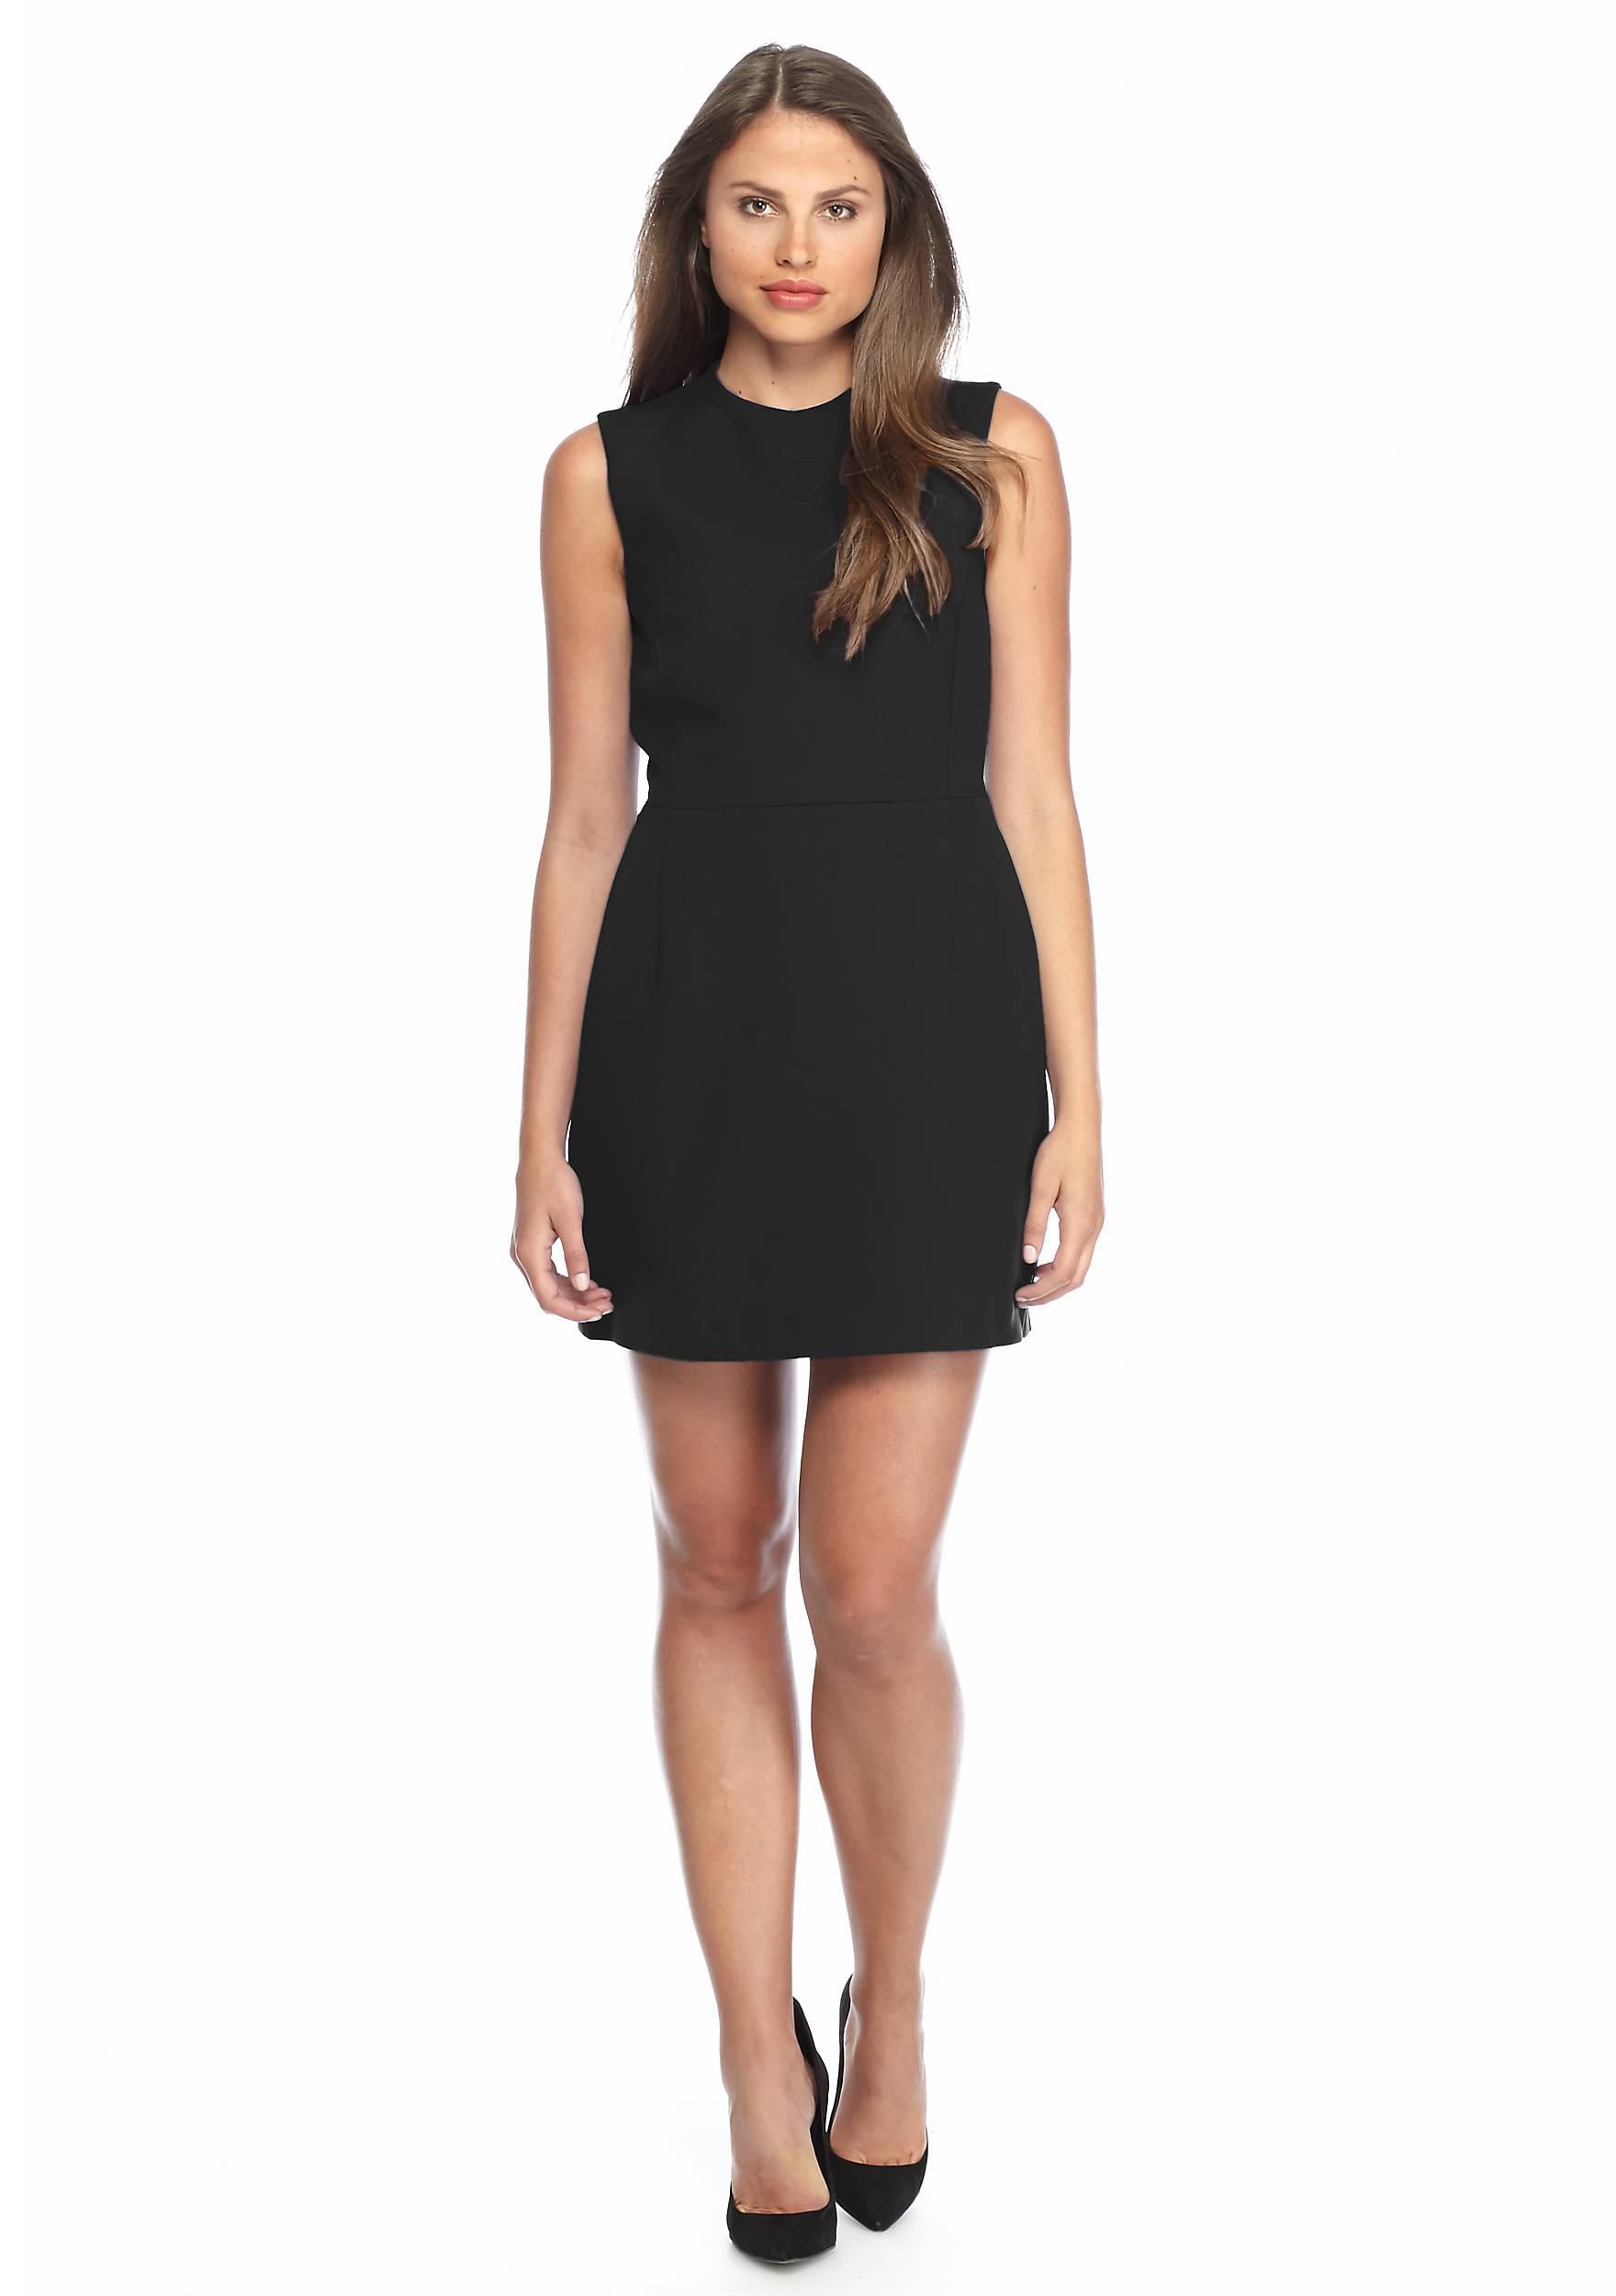 Emejing Belk Dresses Pictures - Musicsharghi.us - musicsharghi.us